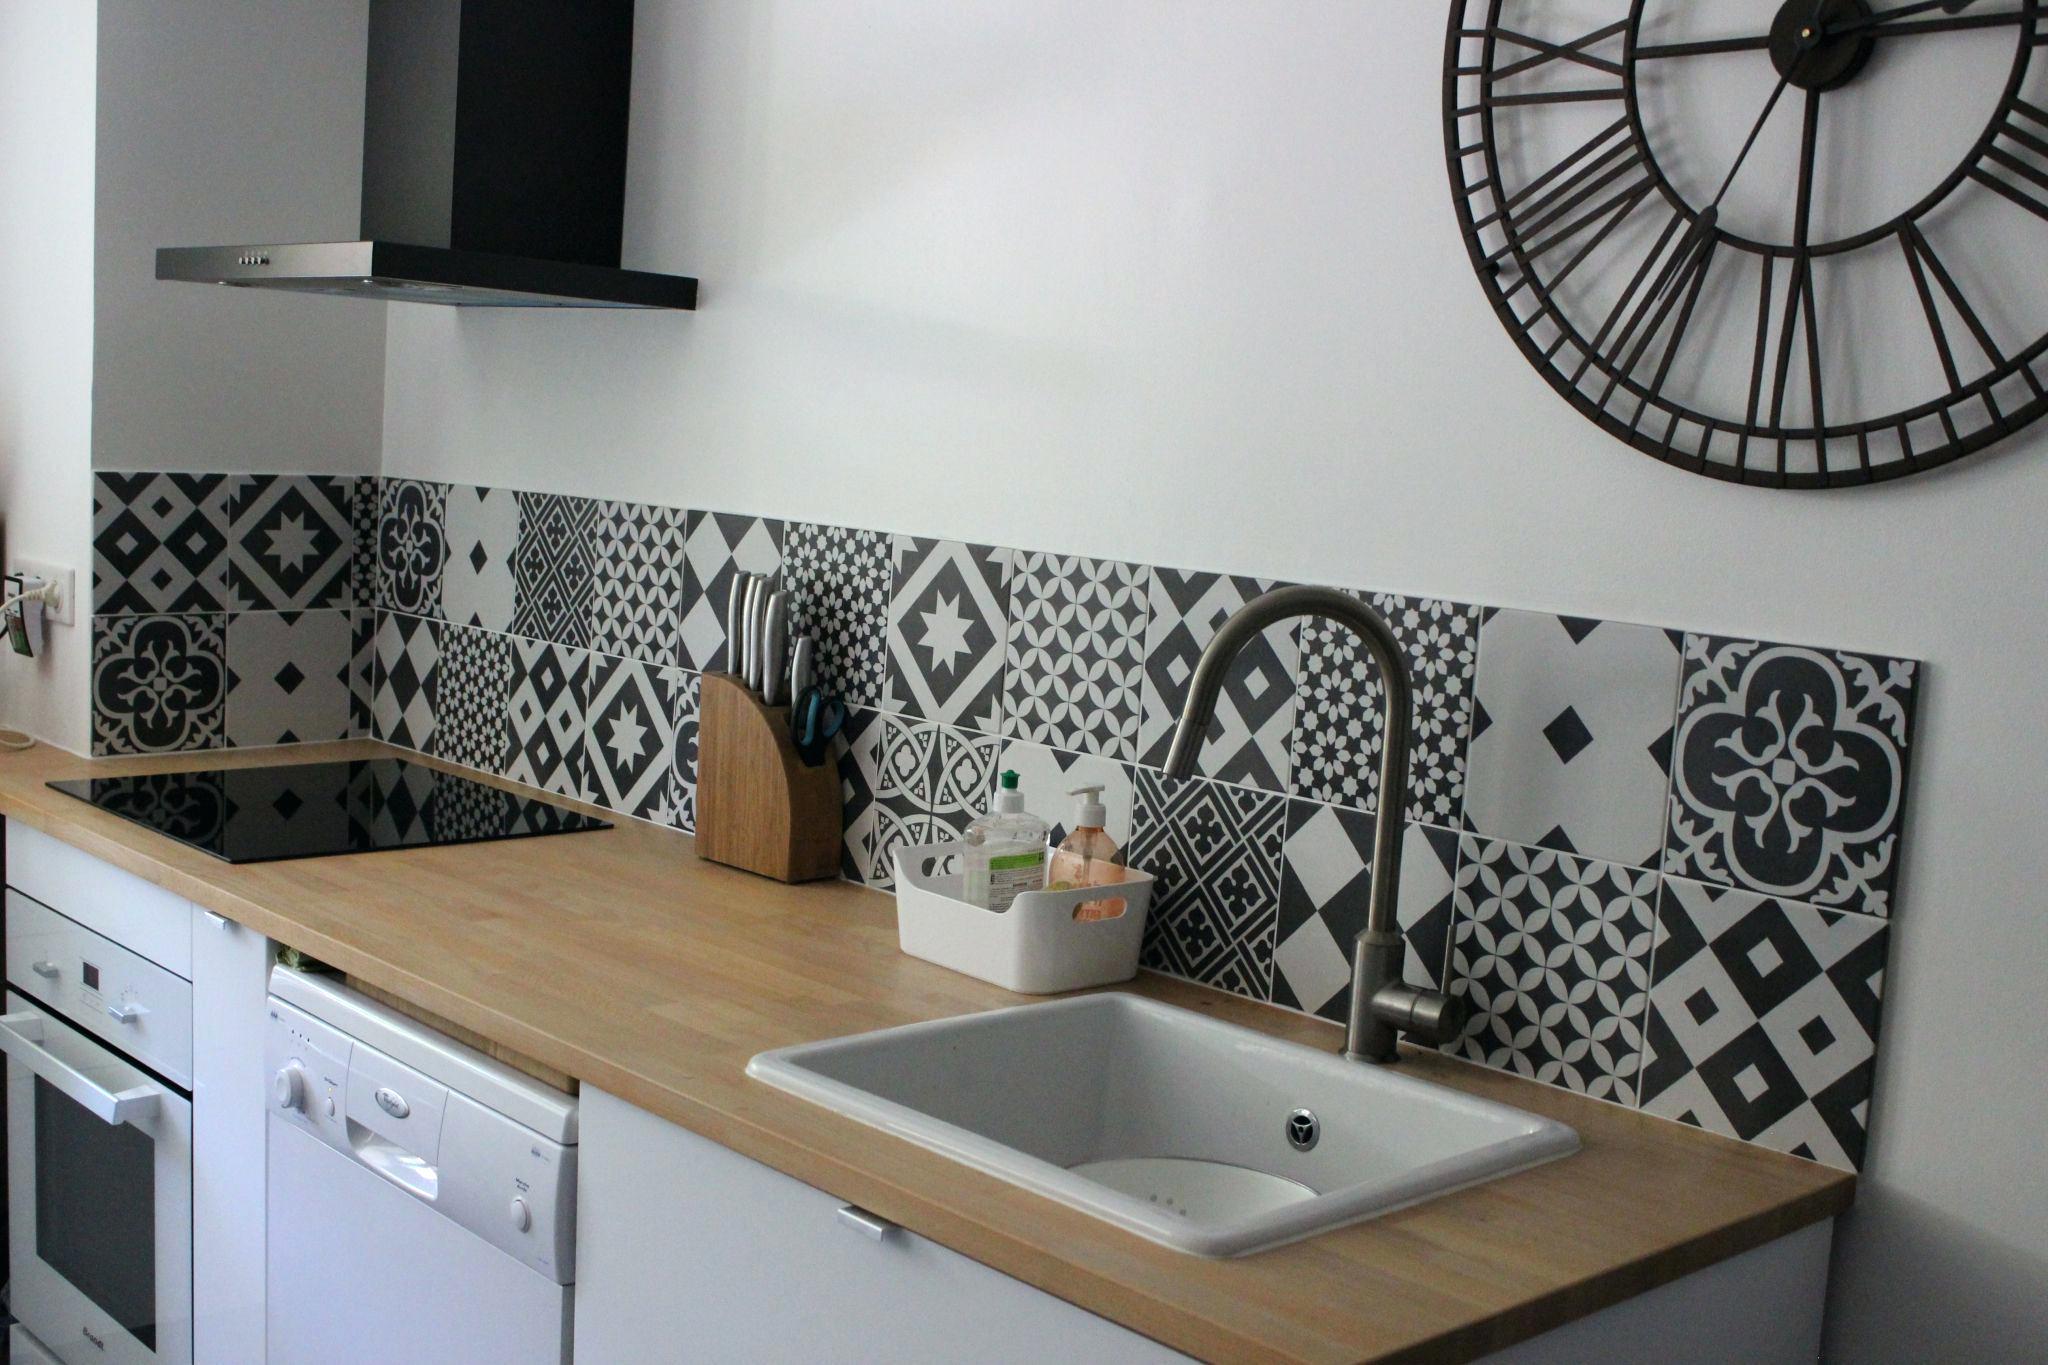 Credence cuisine effet carreau de ciment id e pour cuisine - Carreau ciment cuisine ...